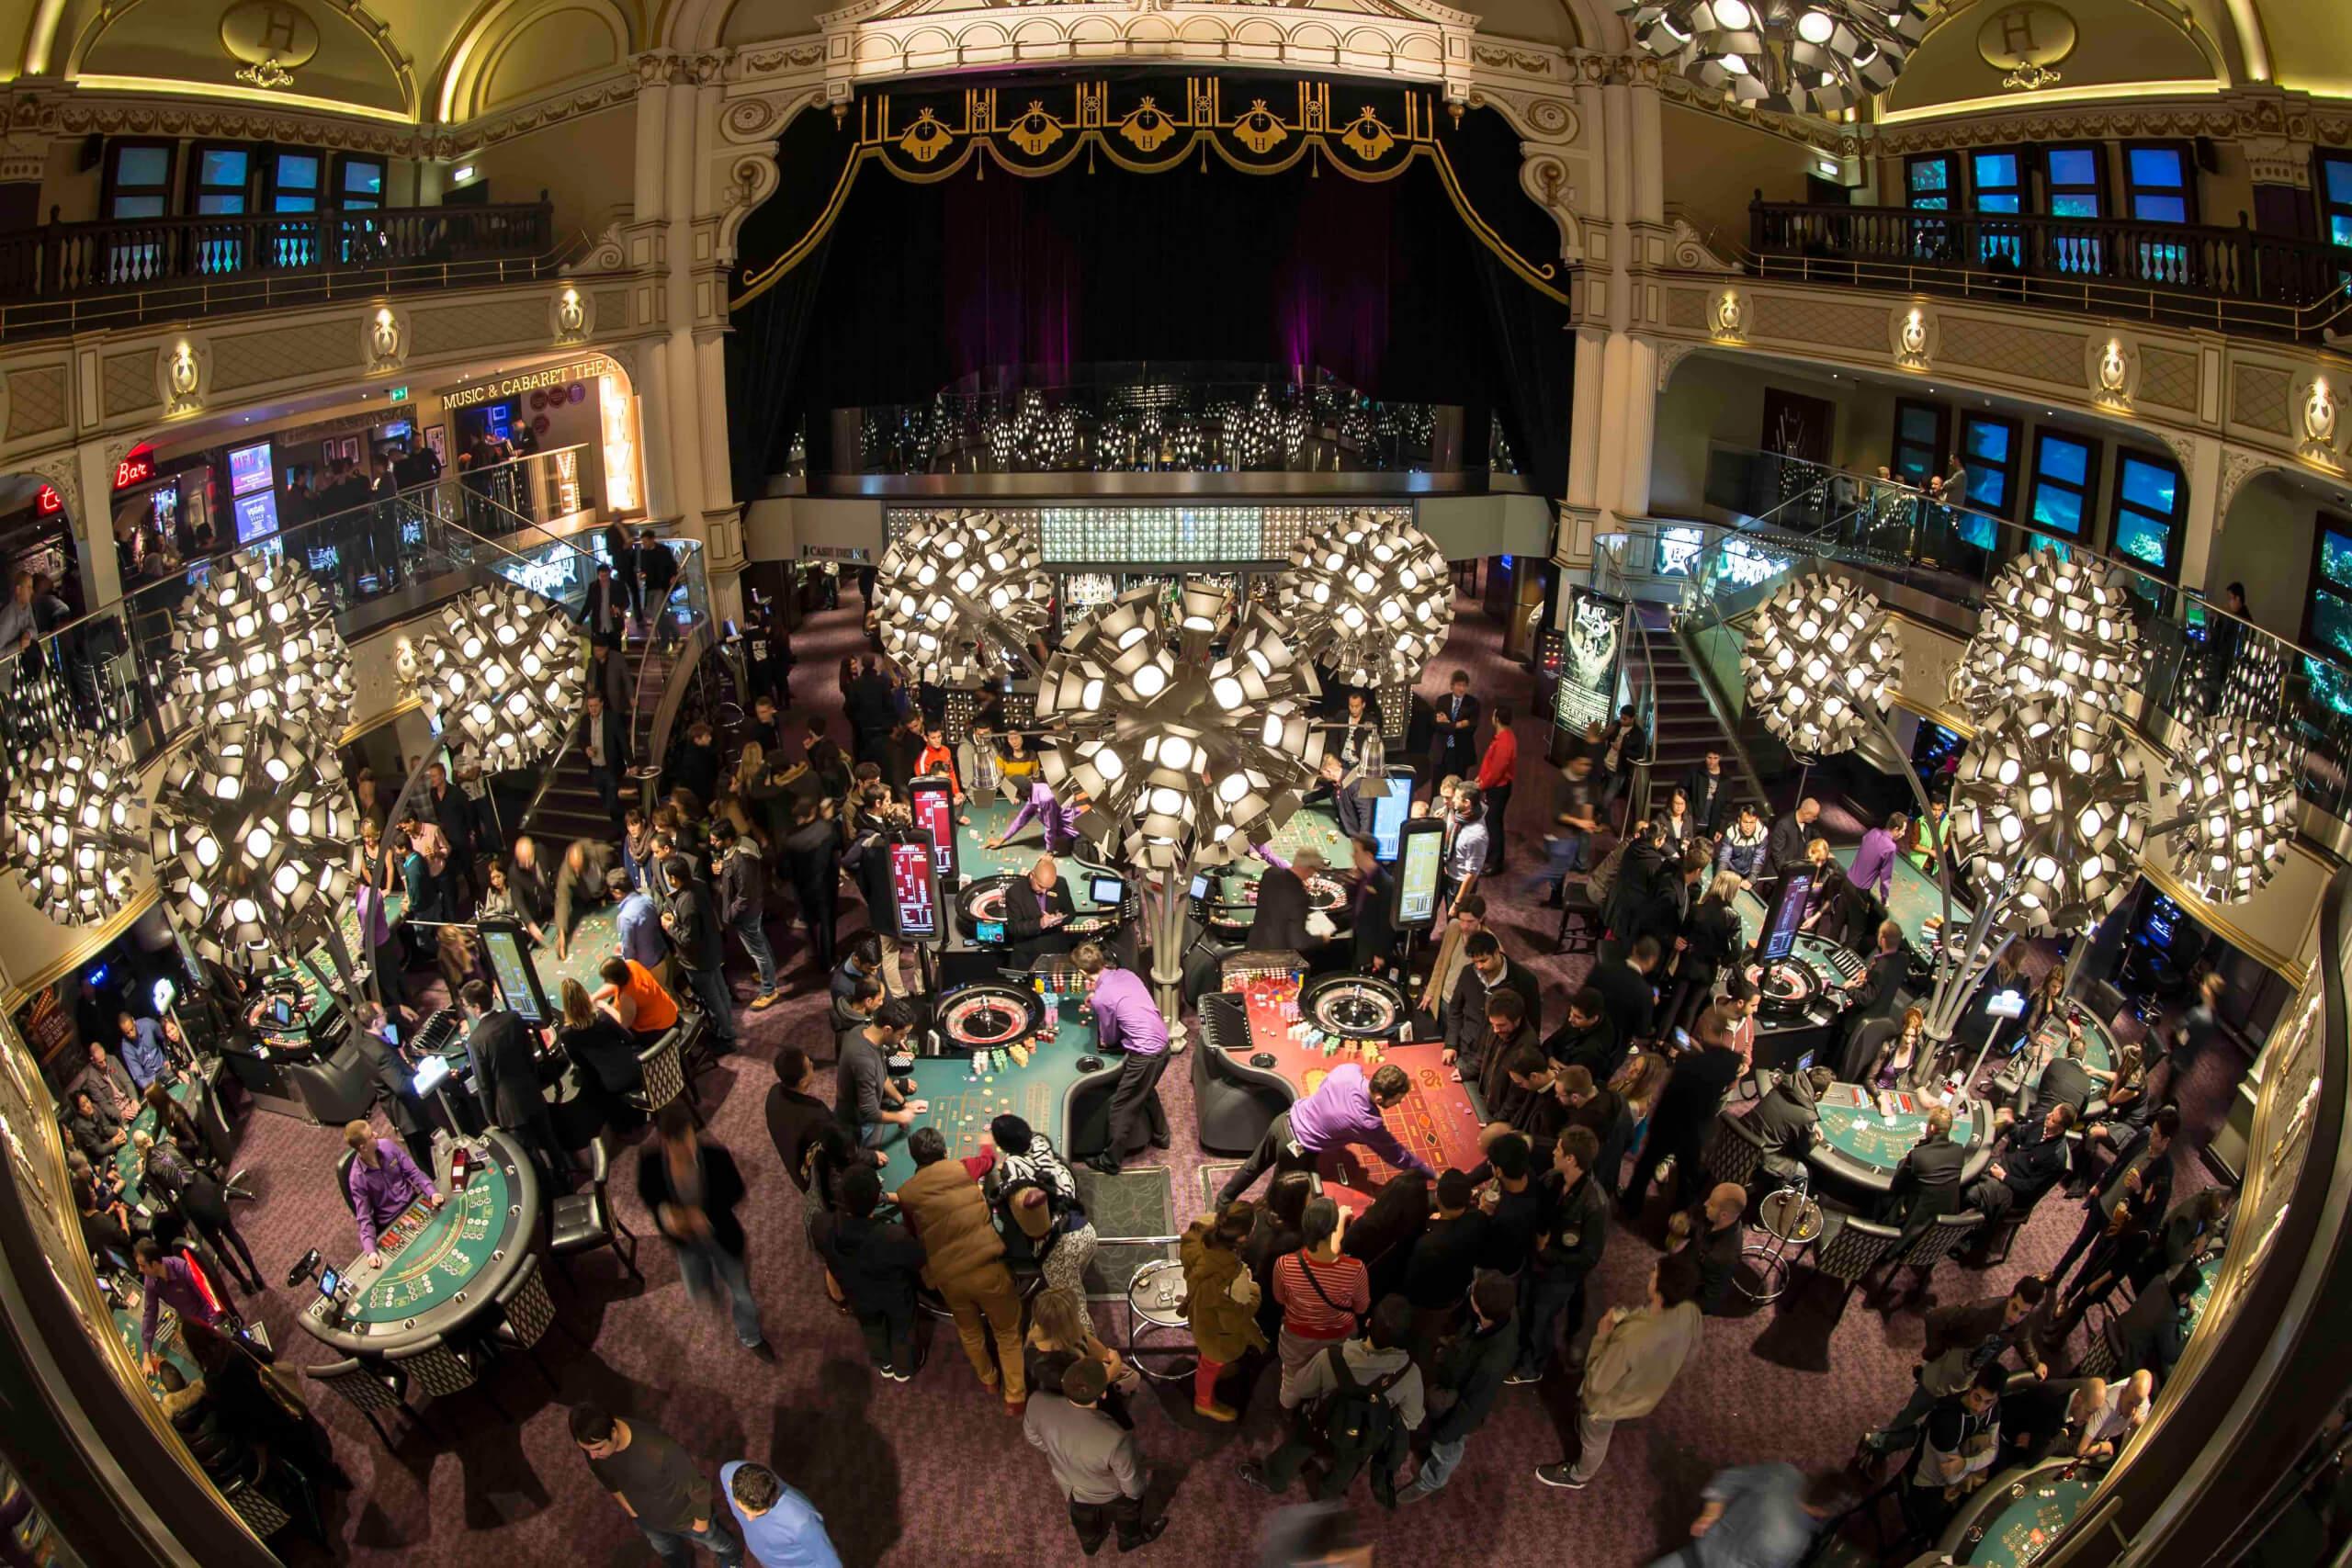 Hippodrome Casino Leicester Square